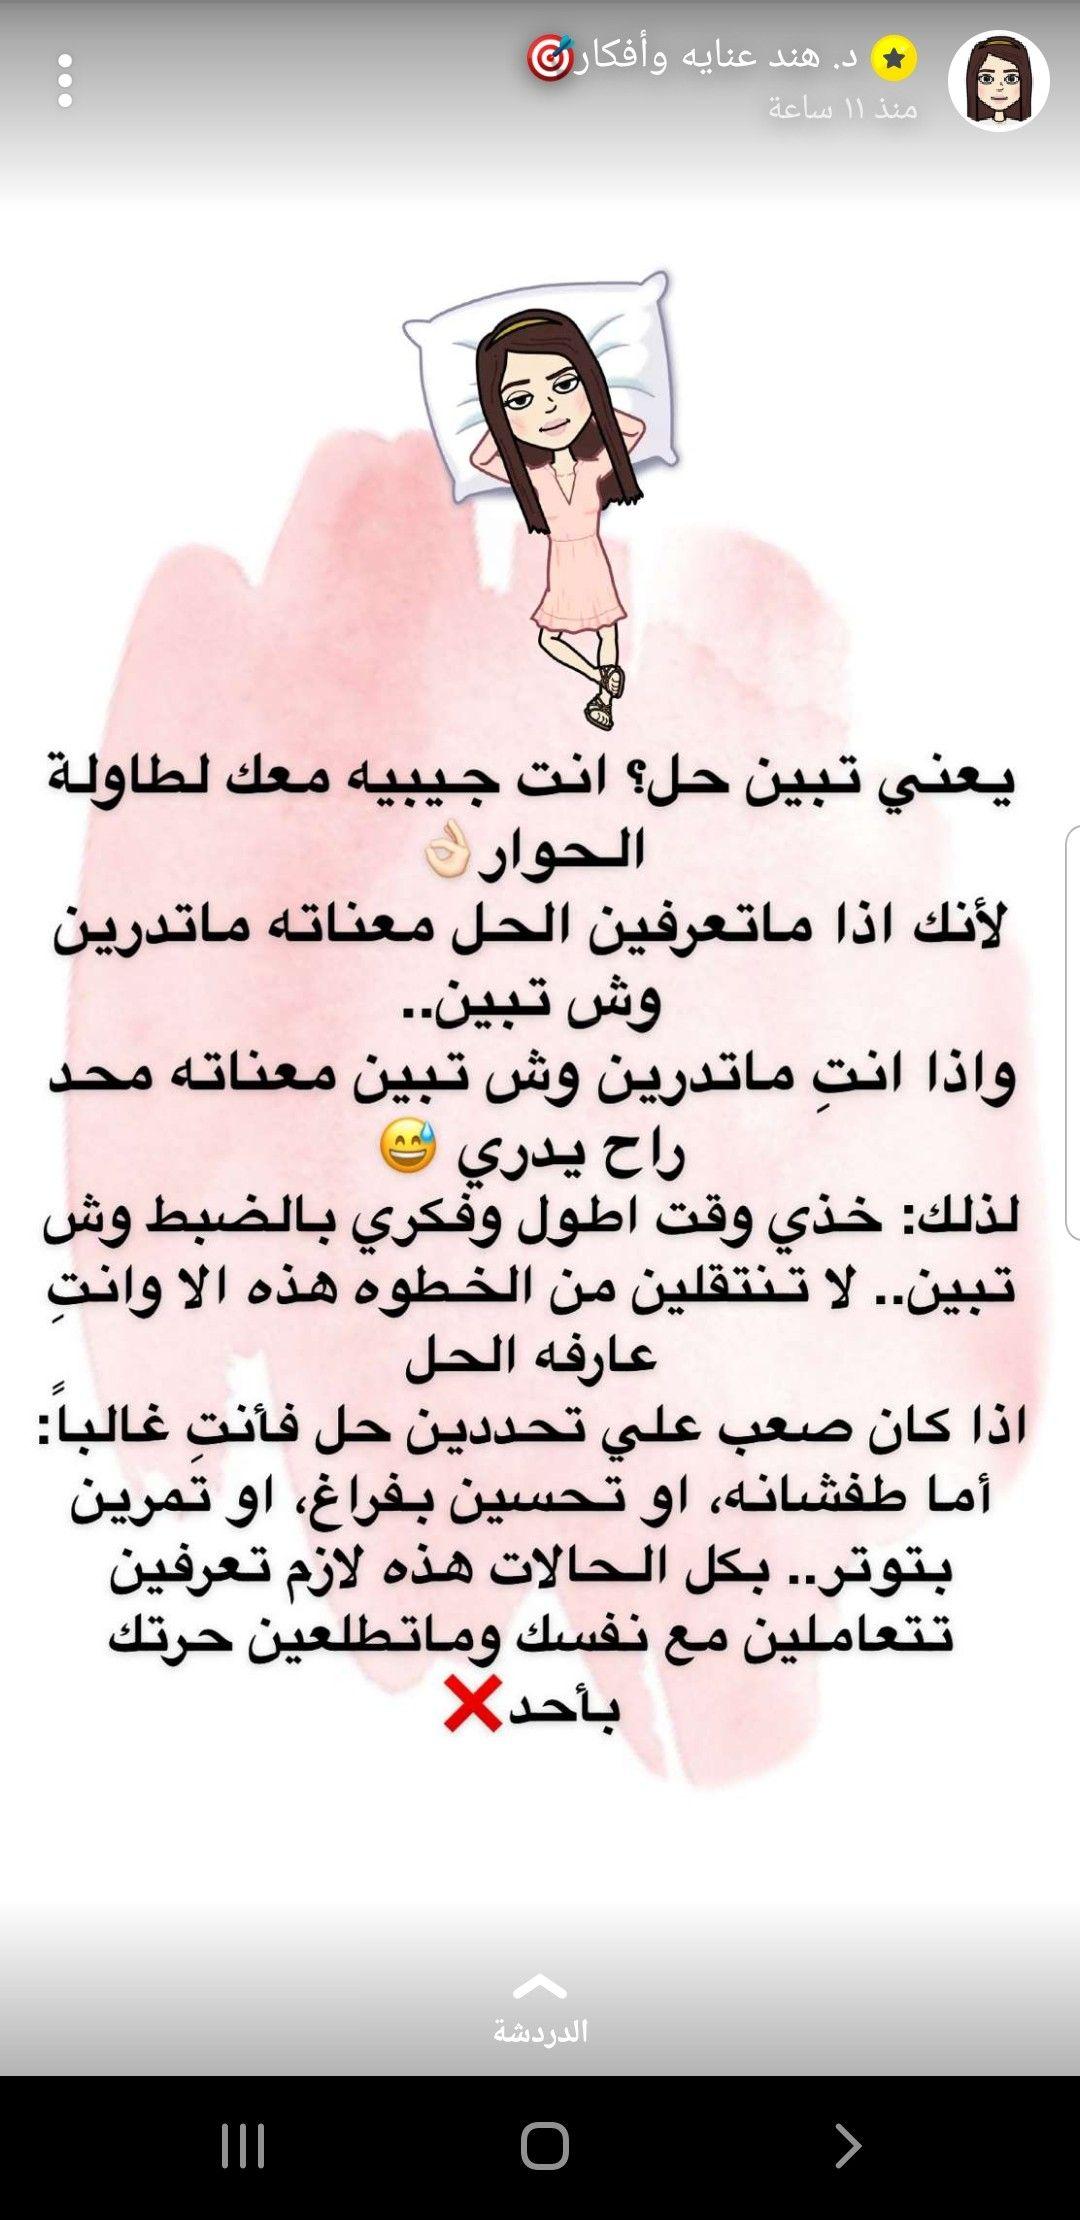 Pin By Sana Jassim On اتكيت التعامل مع ازرار المشاكل بين اثنين Im A Lady Life Rules Word Search Puzzle